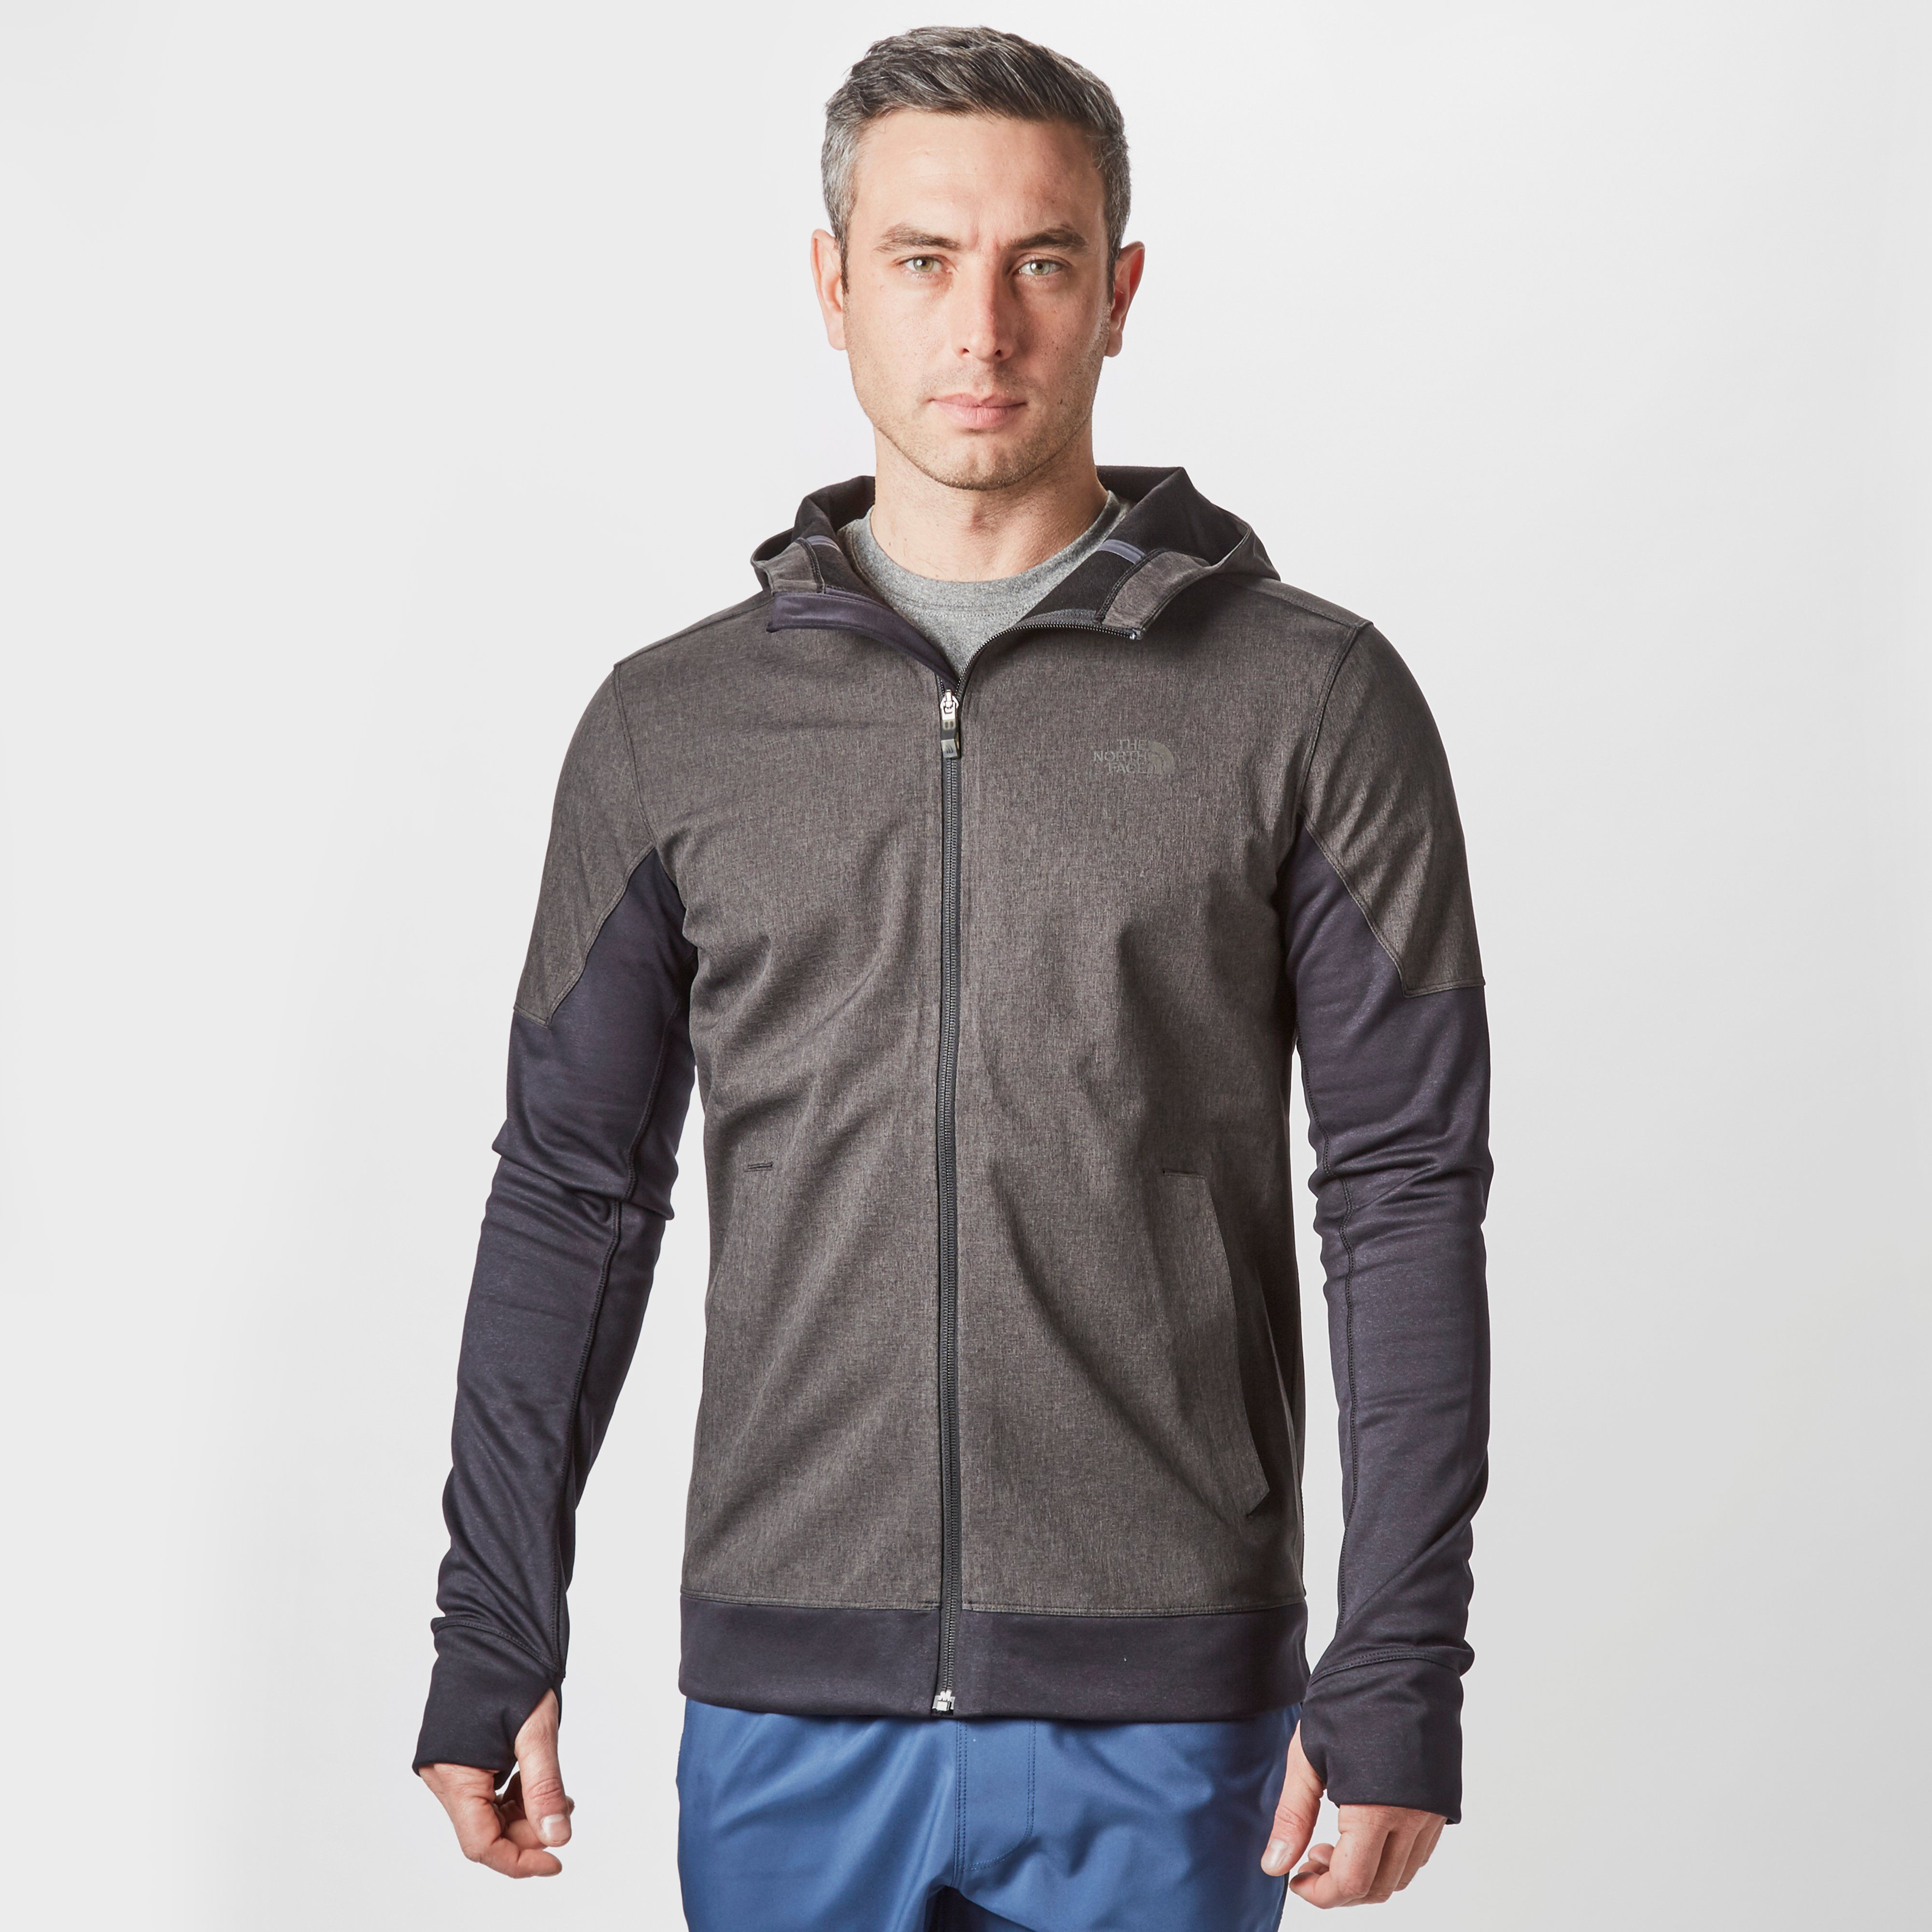 THE NORTH FACE Men's Mountain Athletics Kilowatt Jacket